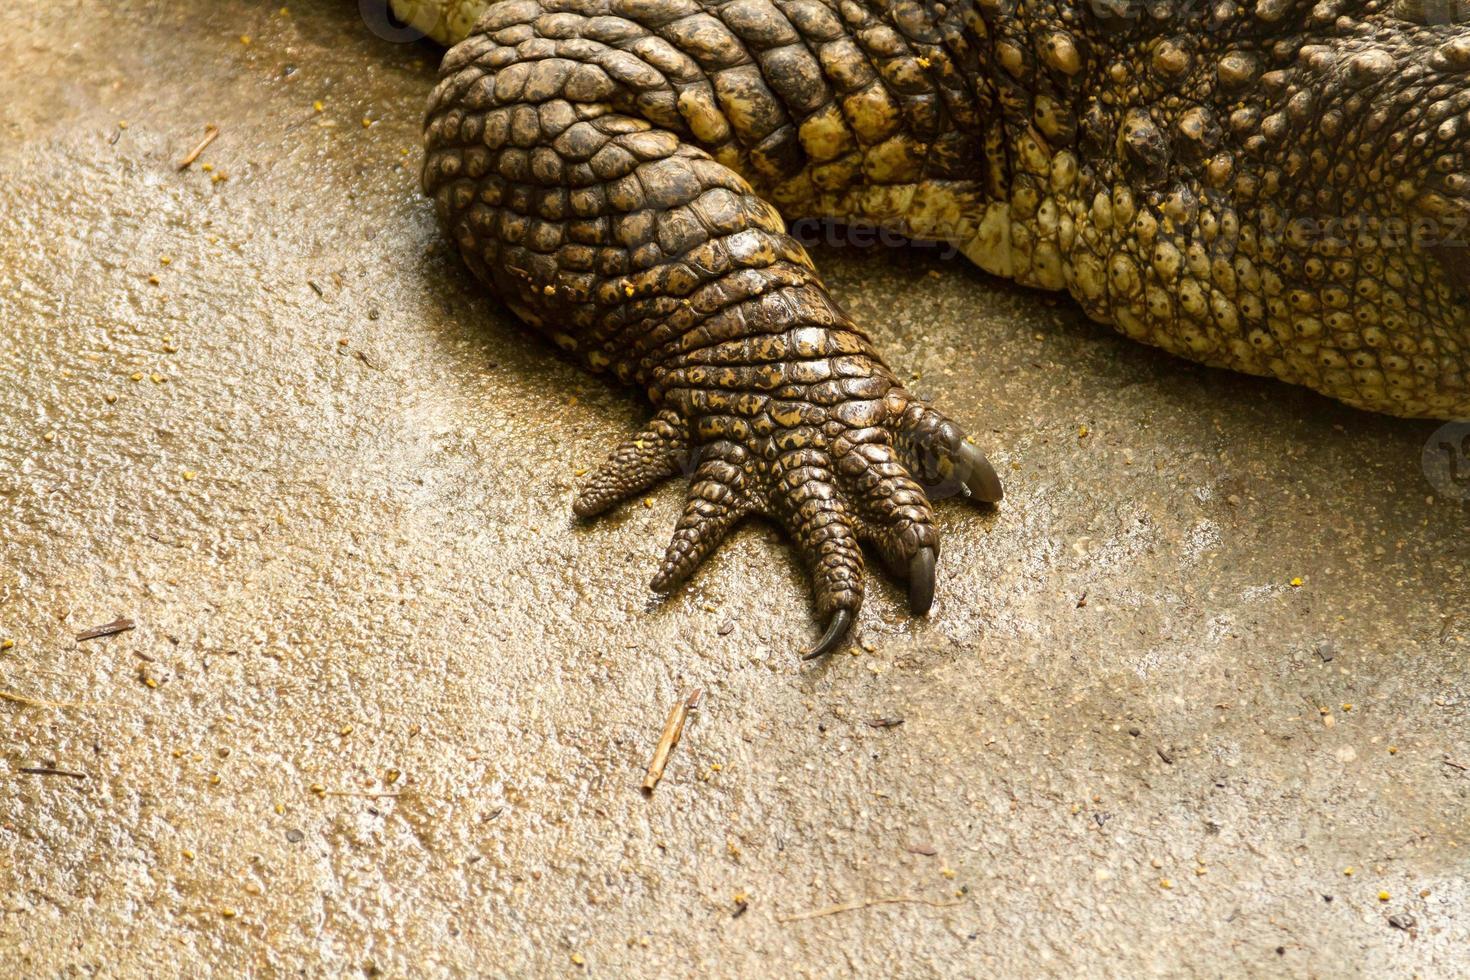 pé crocodilo foto